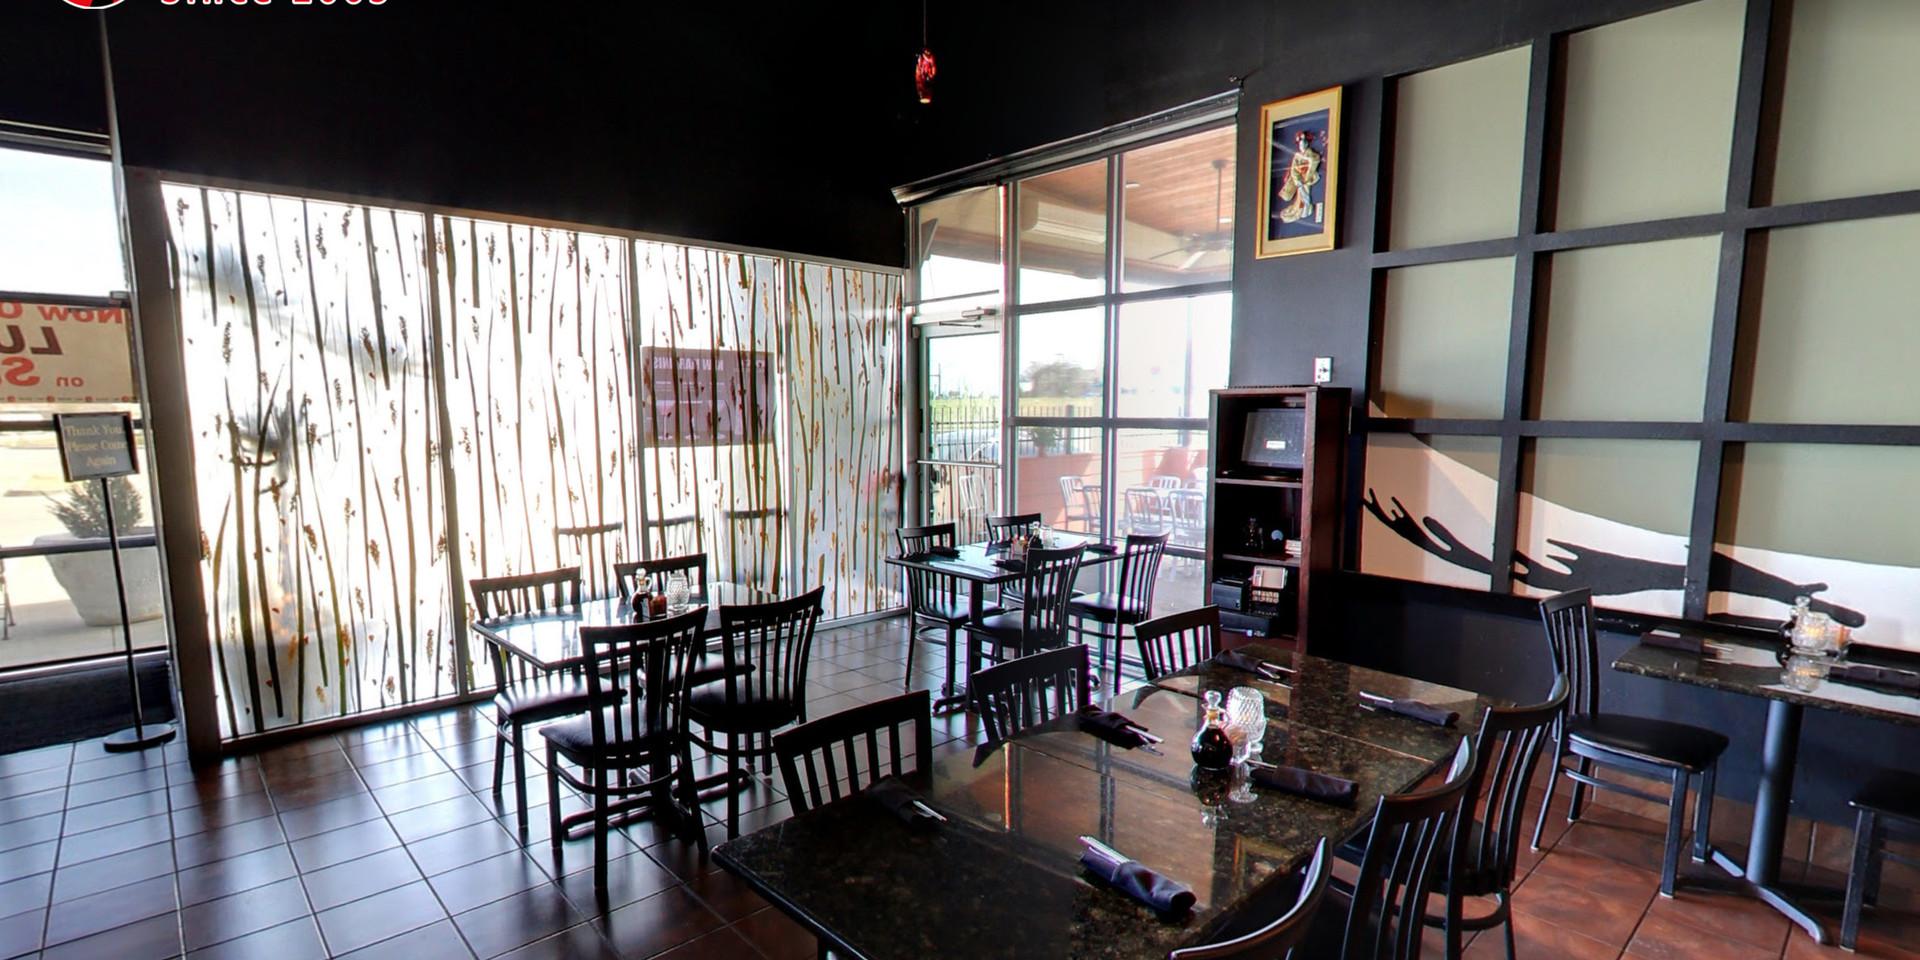 Mk_s Sushi Western Center - Store_03.jpg